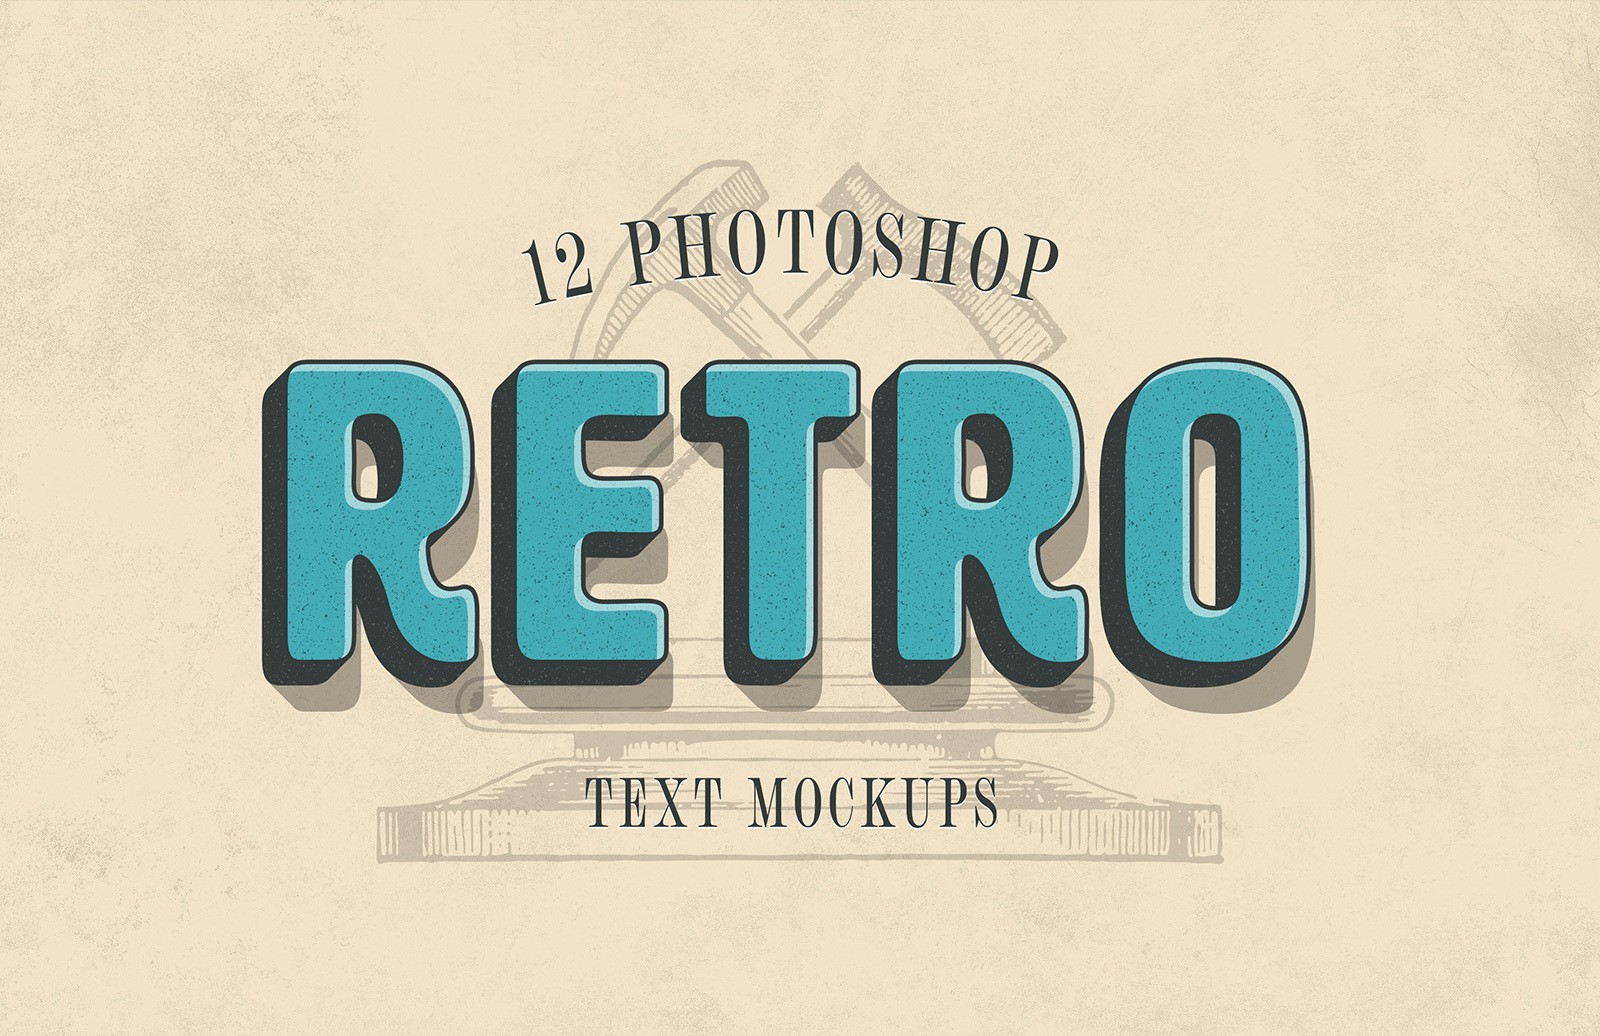 Photoshop Retro Text Mockups